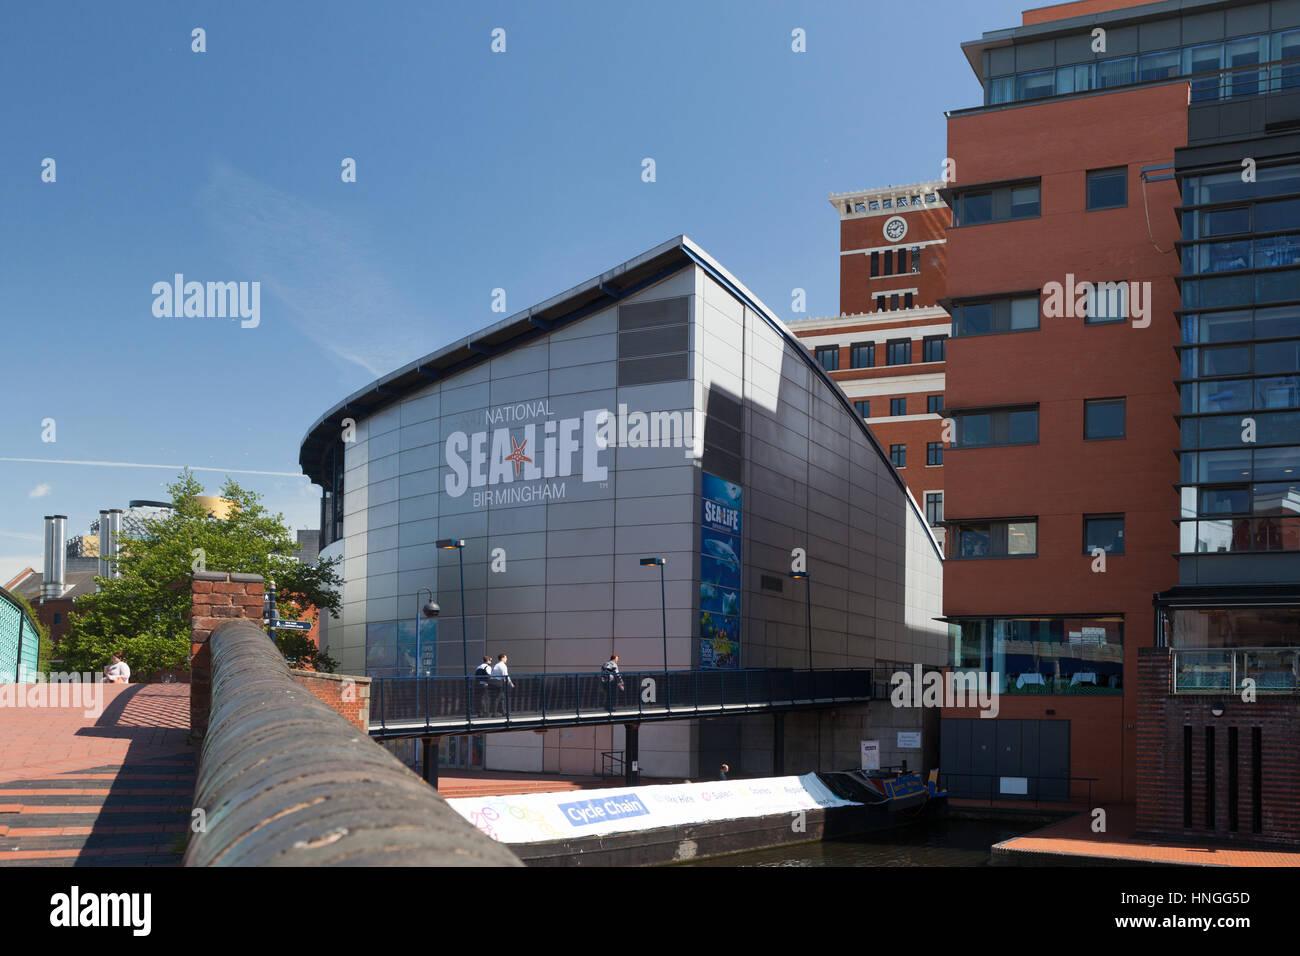 The National Sealife Centre in Birmingham UK. - Stock Image